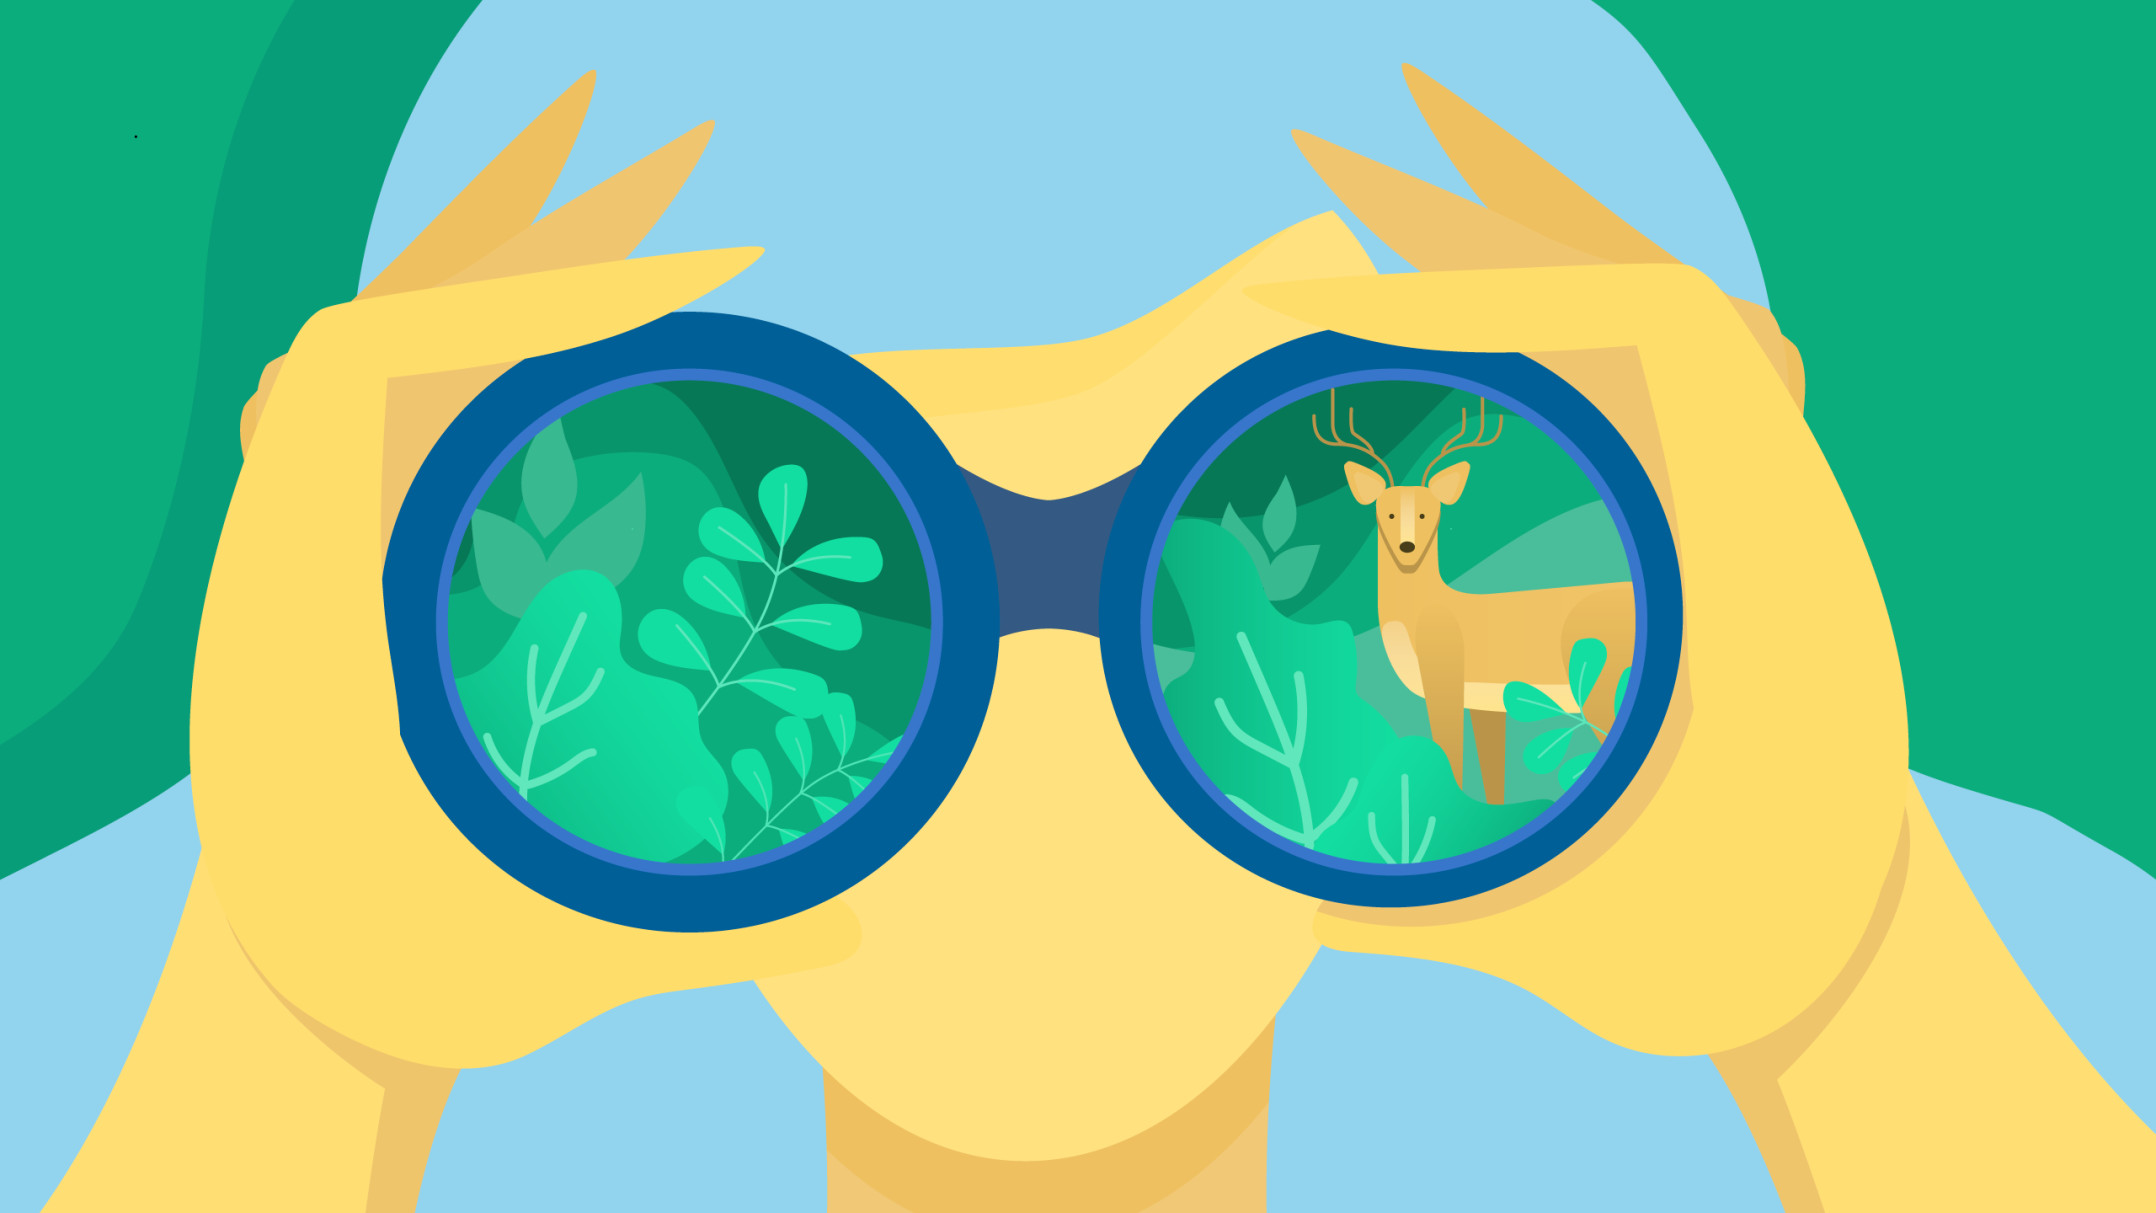 Organic search: a human figure looking at organic materials through binoculars.